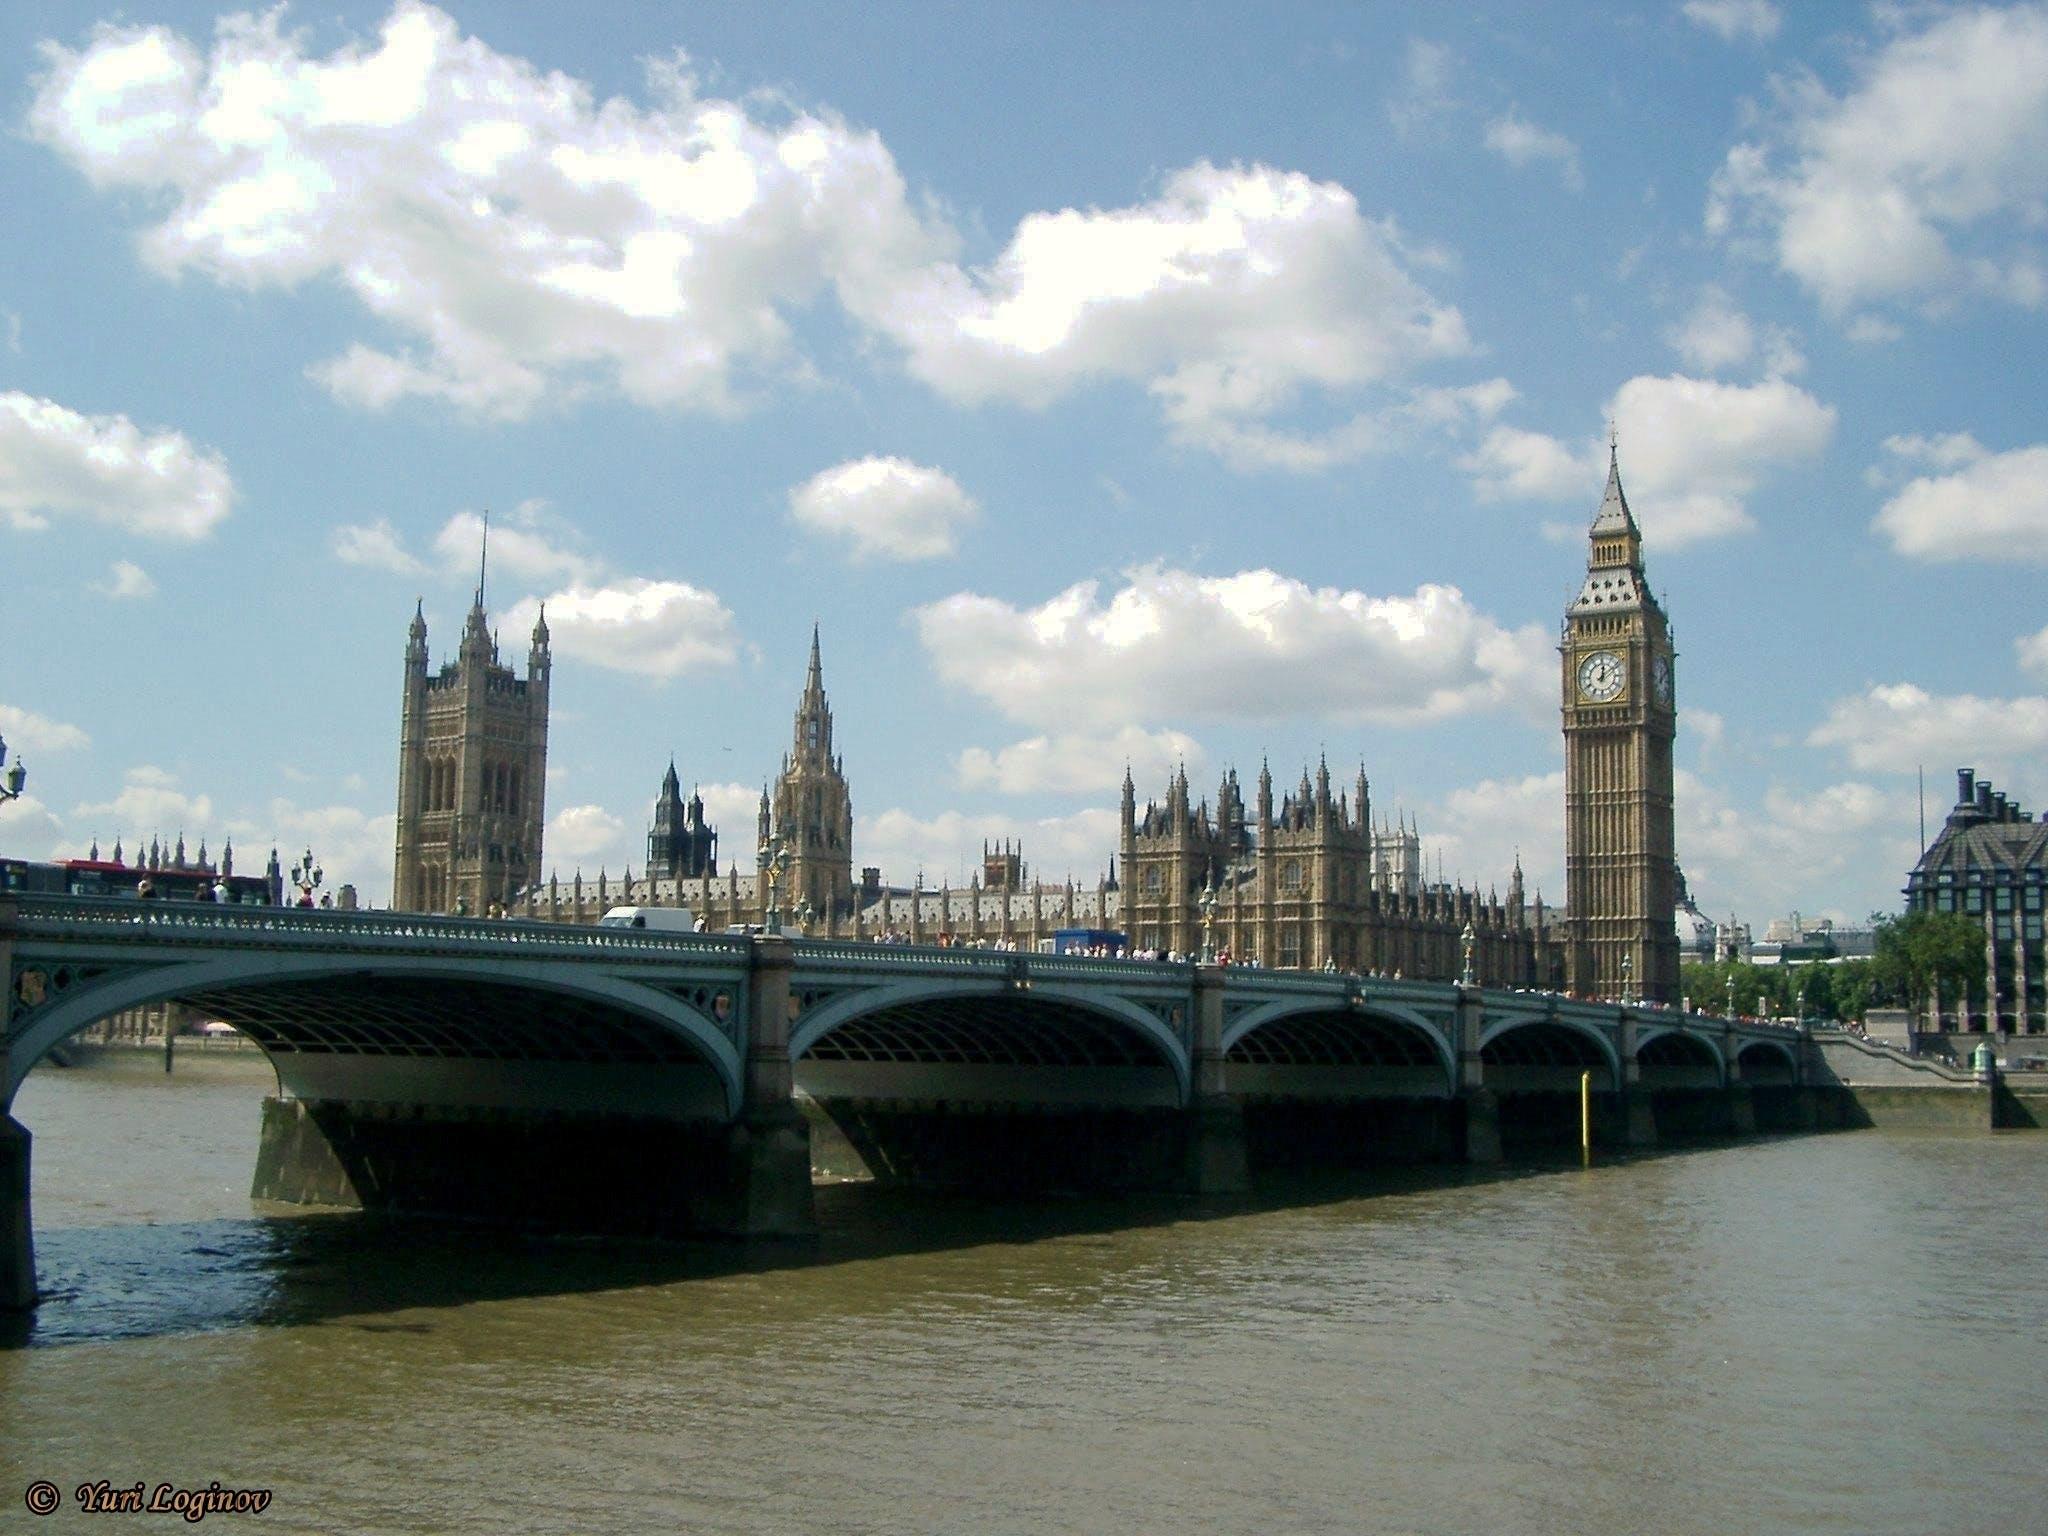 Free stock photo of england, london, united kingdom, Palace of Westminster